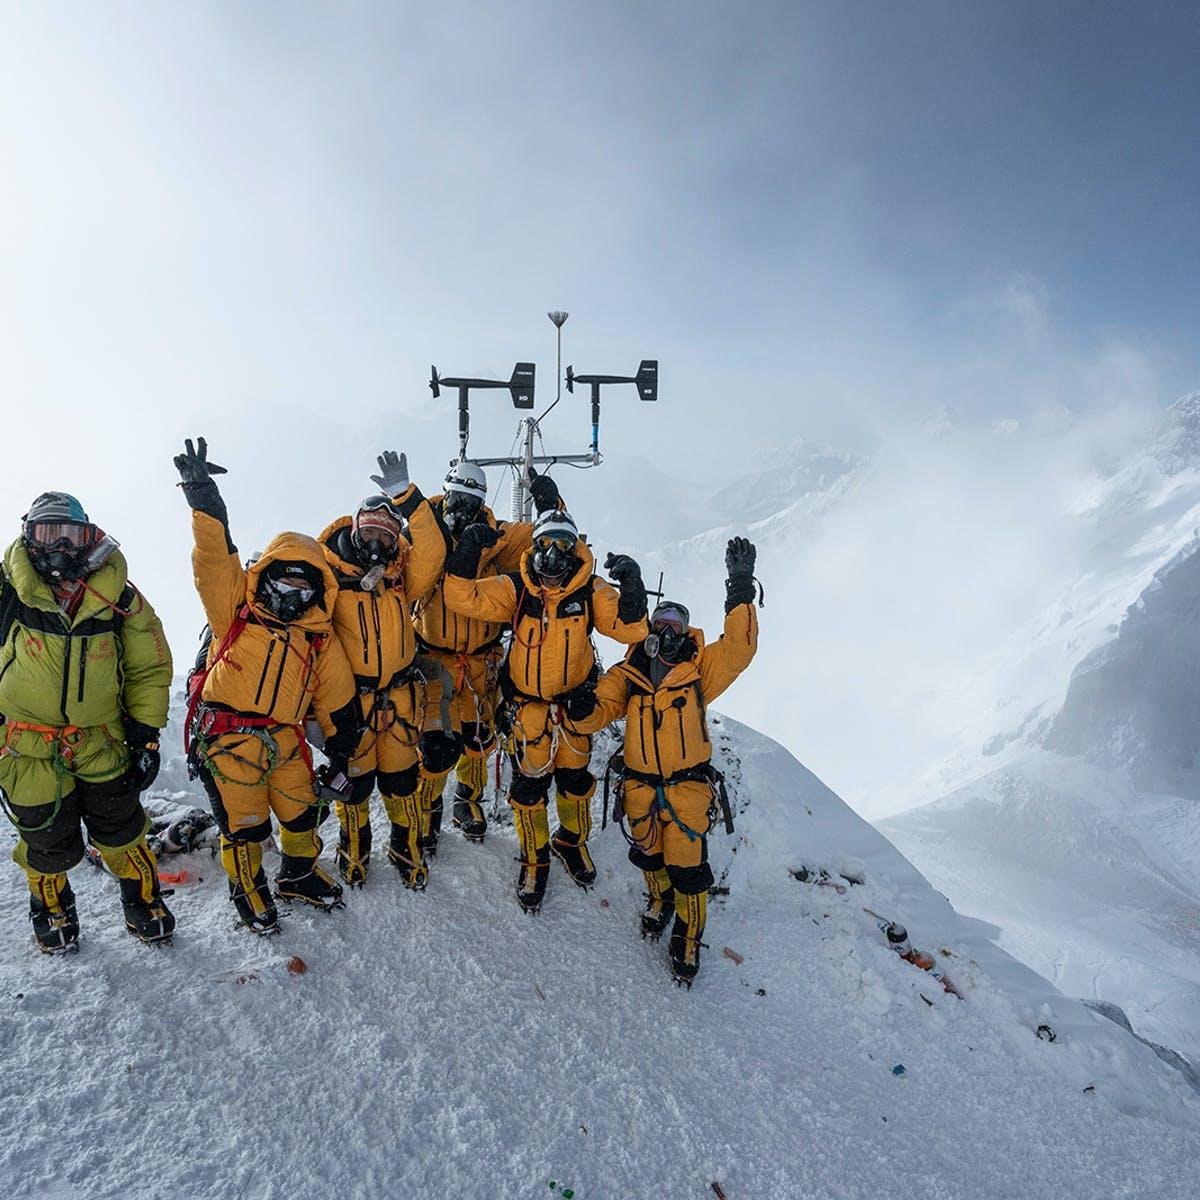 Expedition on Everest Celebrating